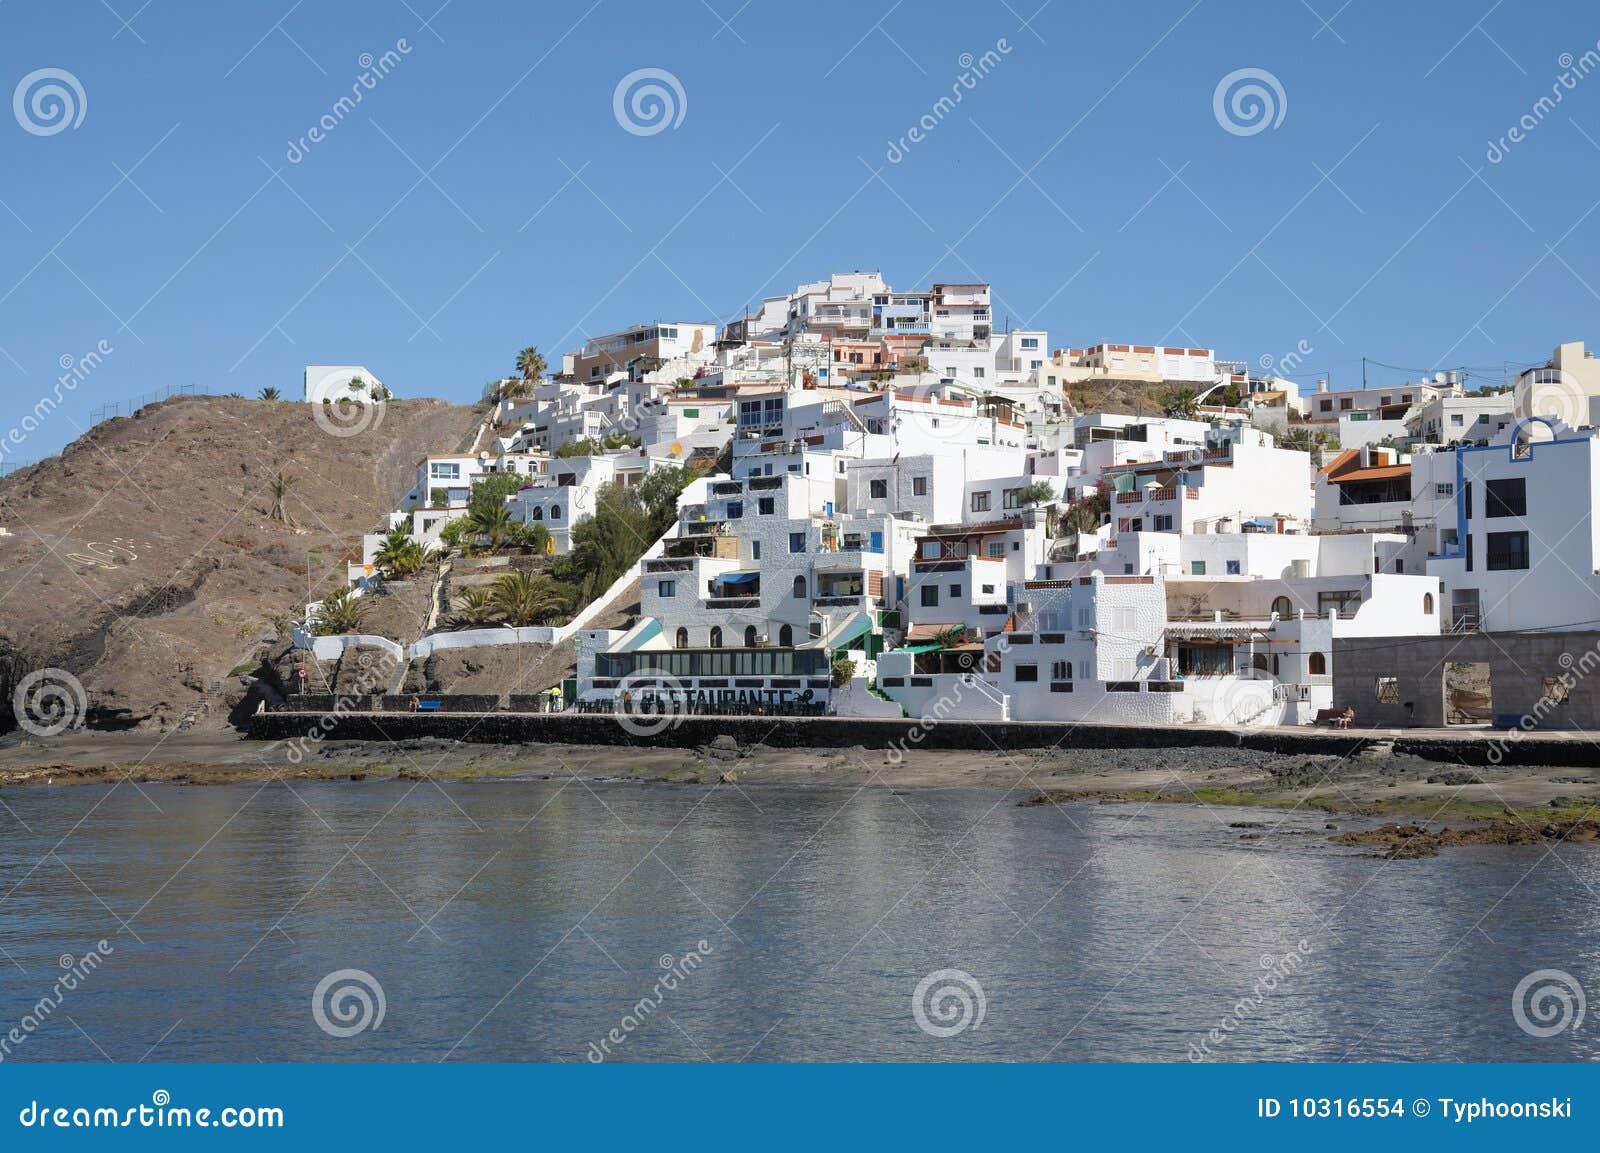 Village Las Playitas  Fuerteventura  Spain Stock Images